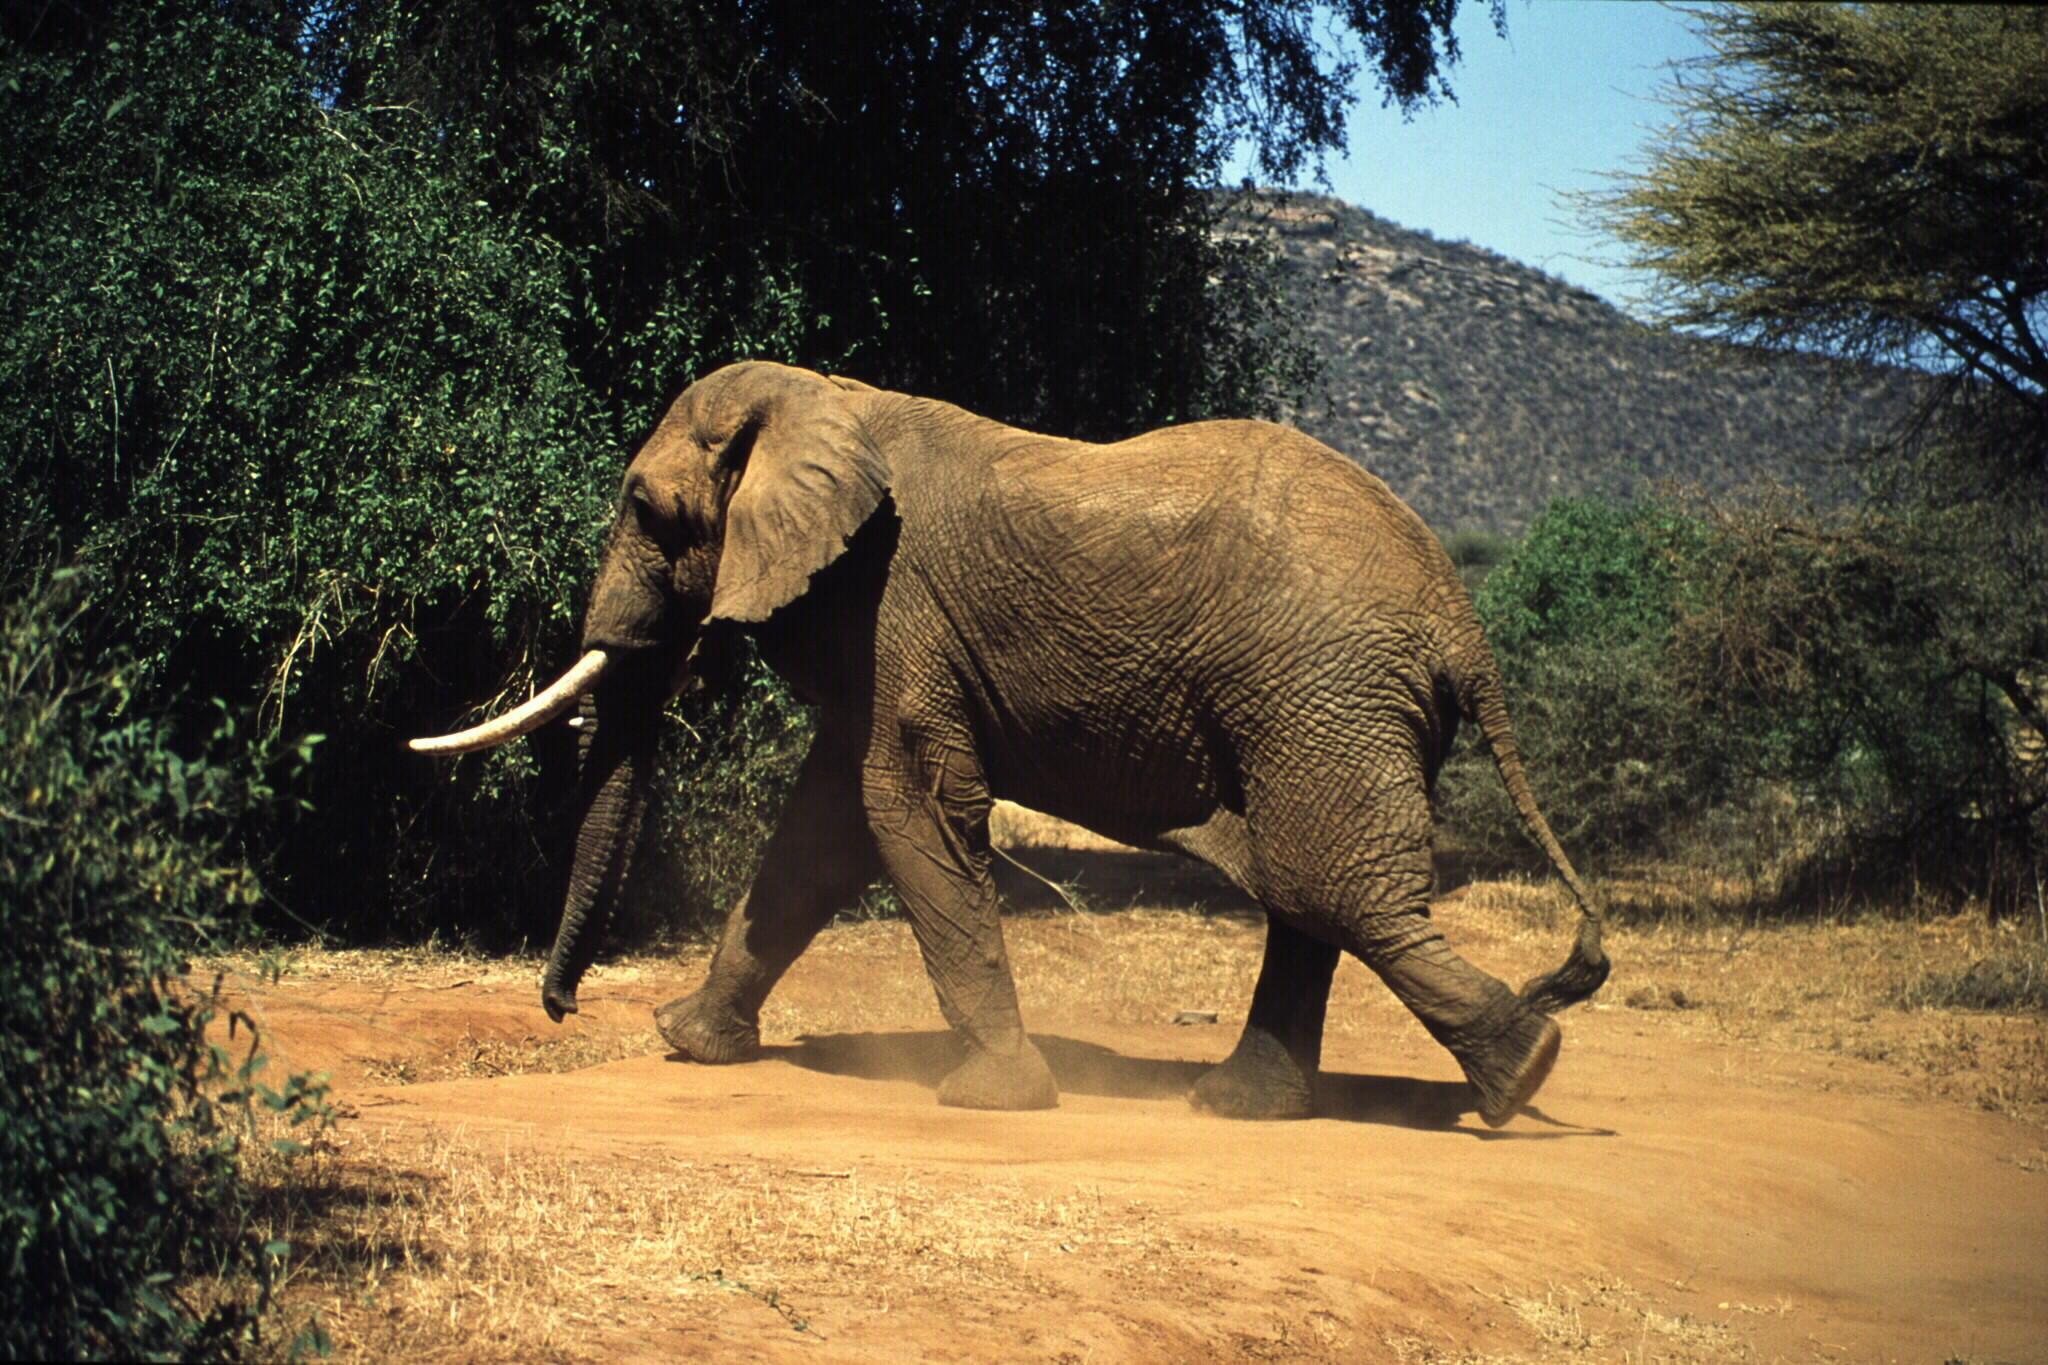 Eléphant (Loxodonta africana) de la famille des Elephantidae.